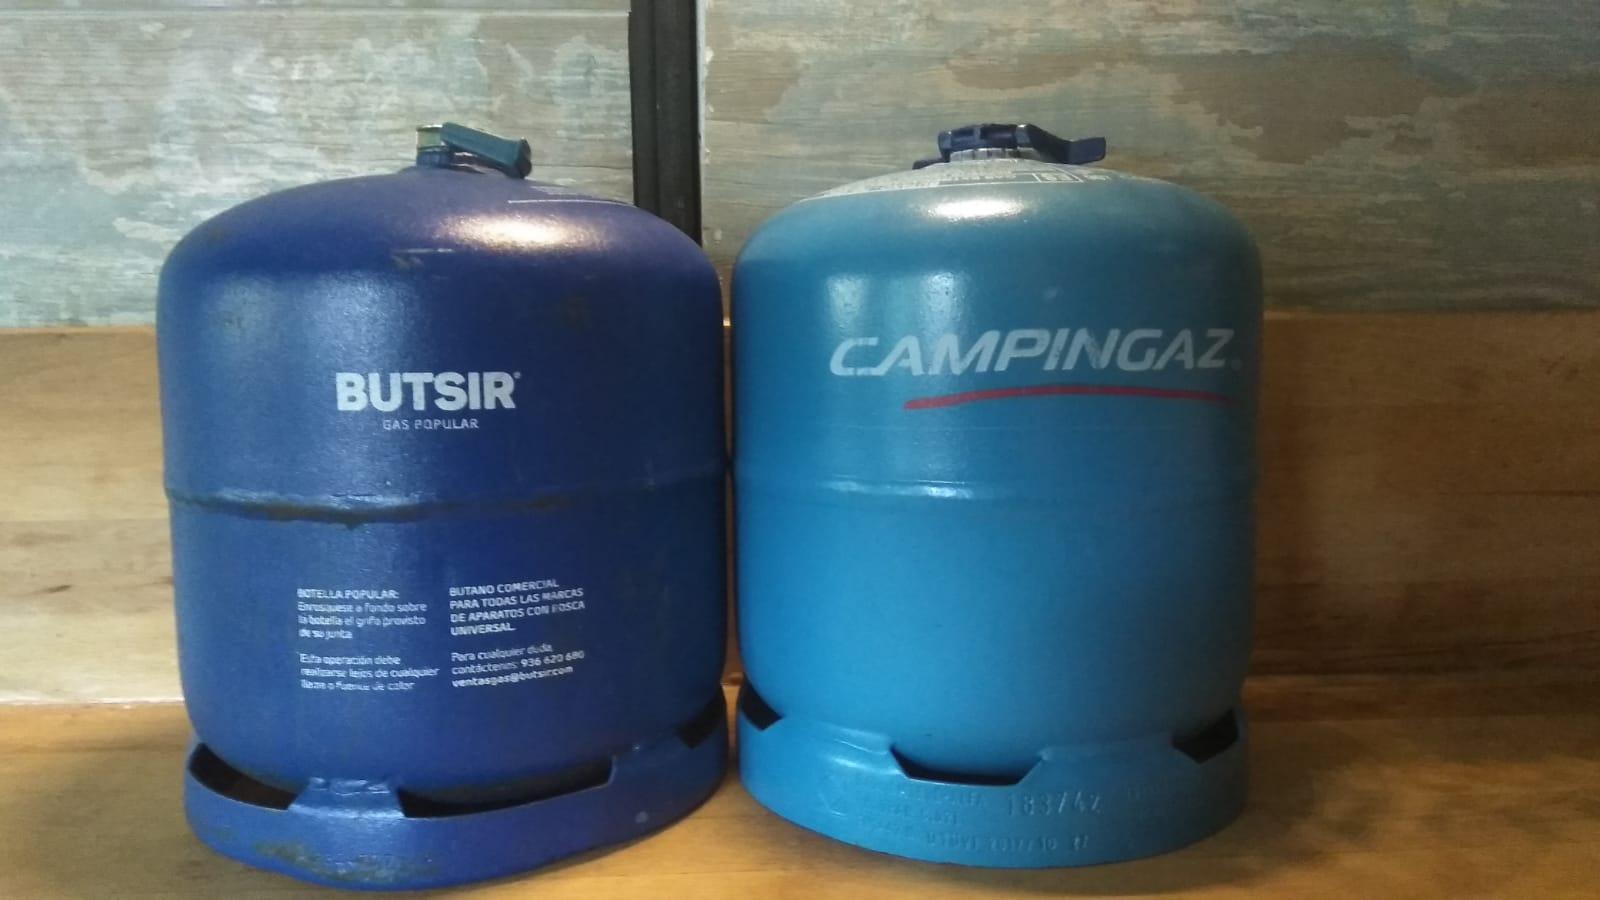 Las dos bombonas de gas